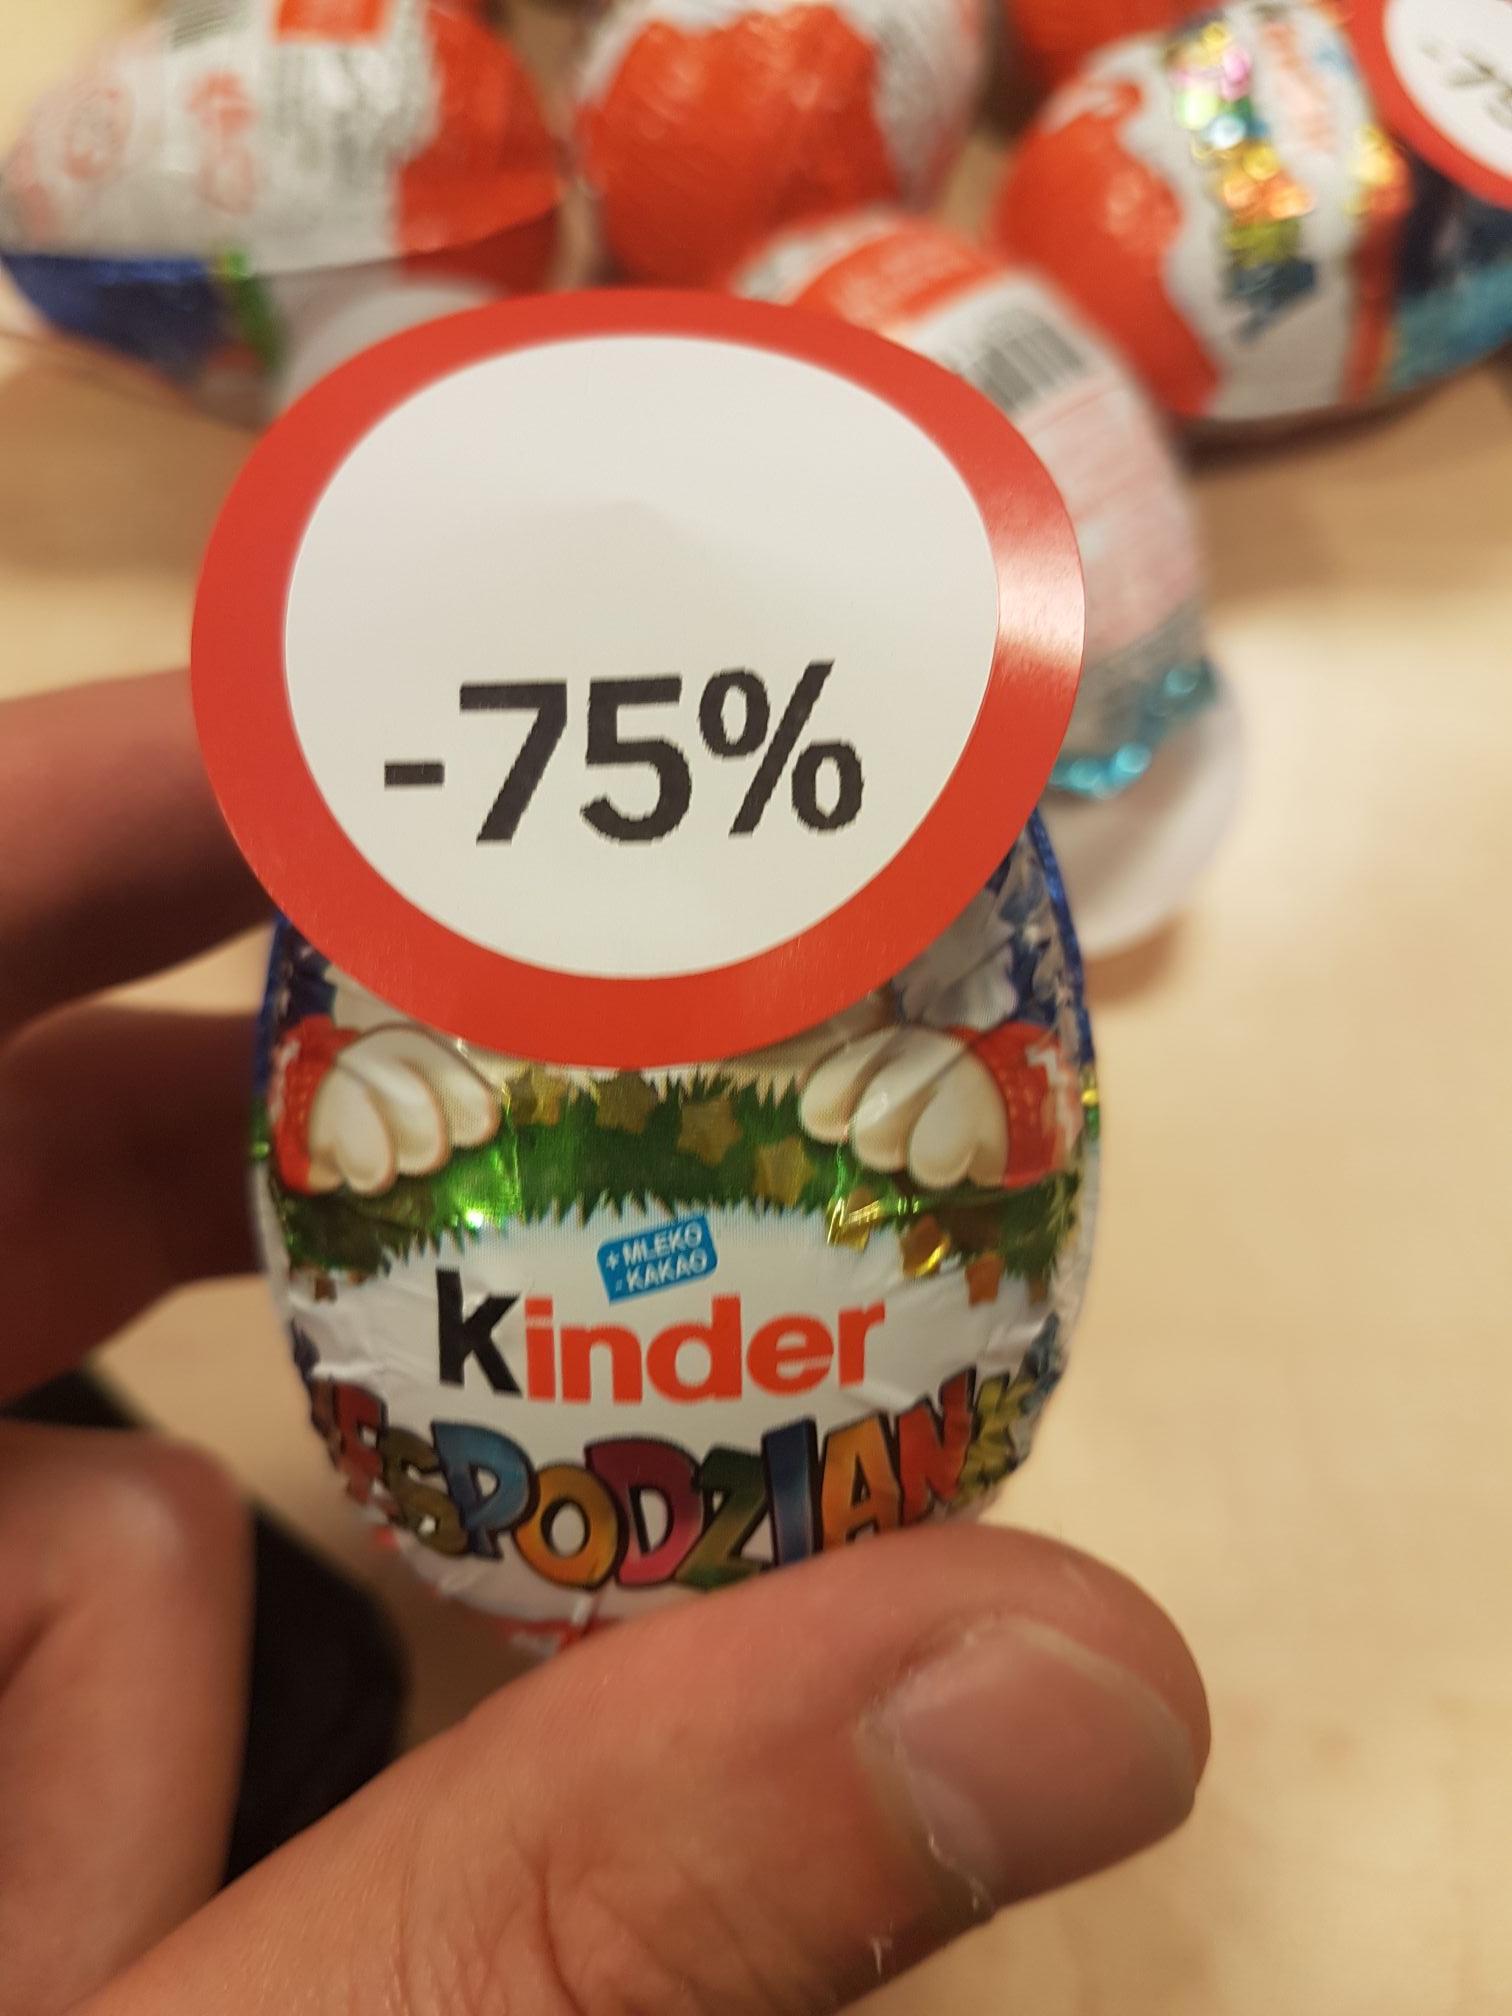 Jajko Kinder niespodzianka za 1.25